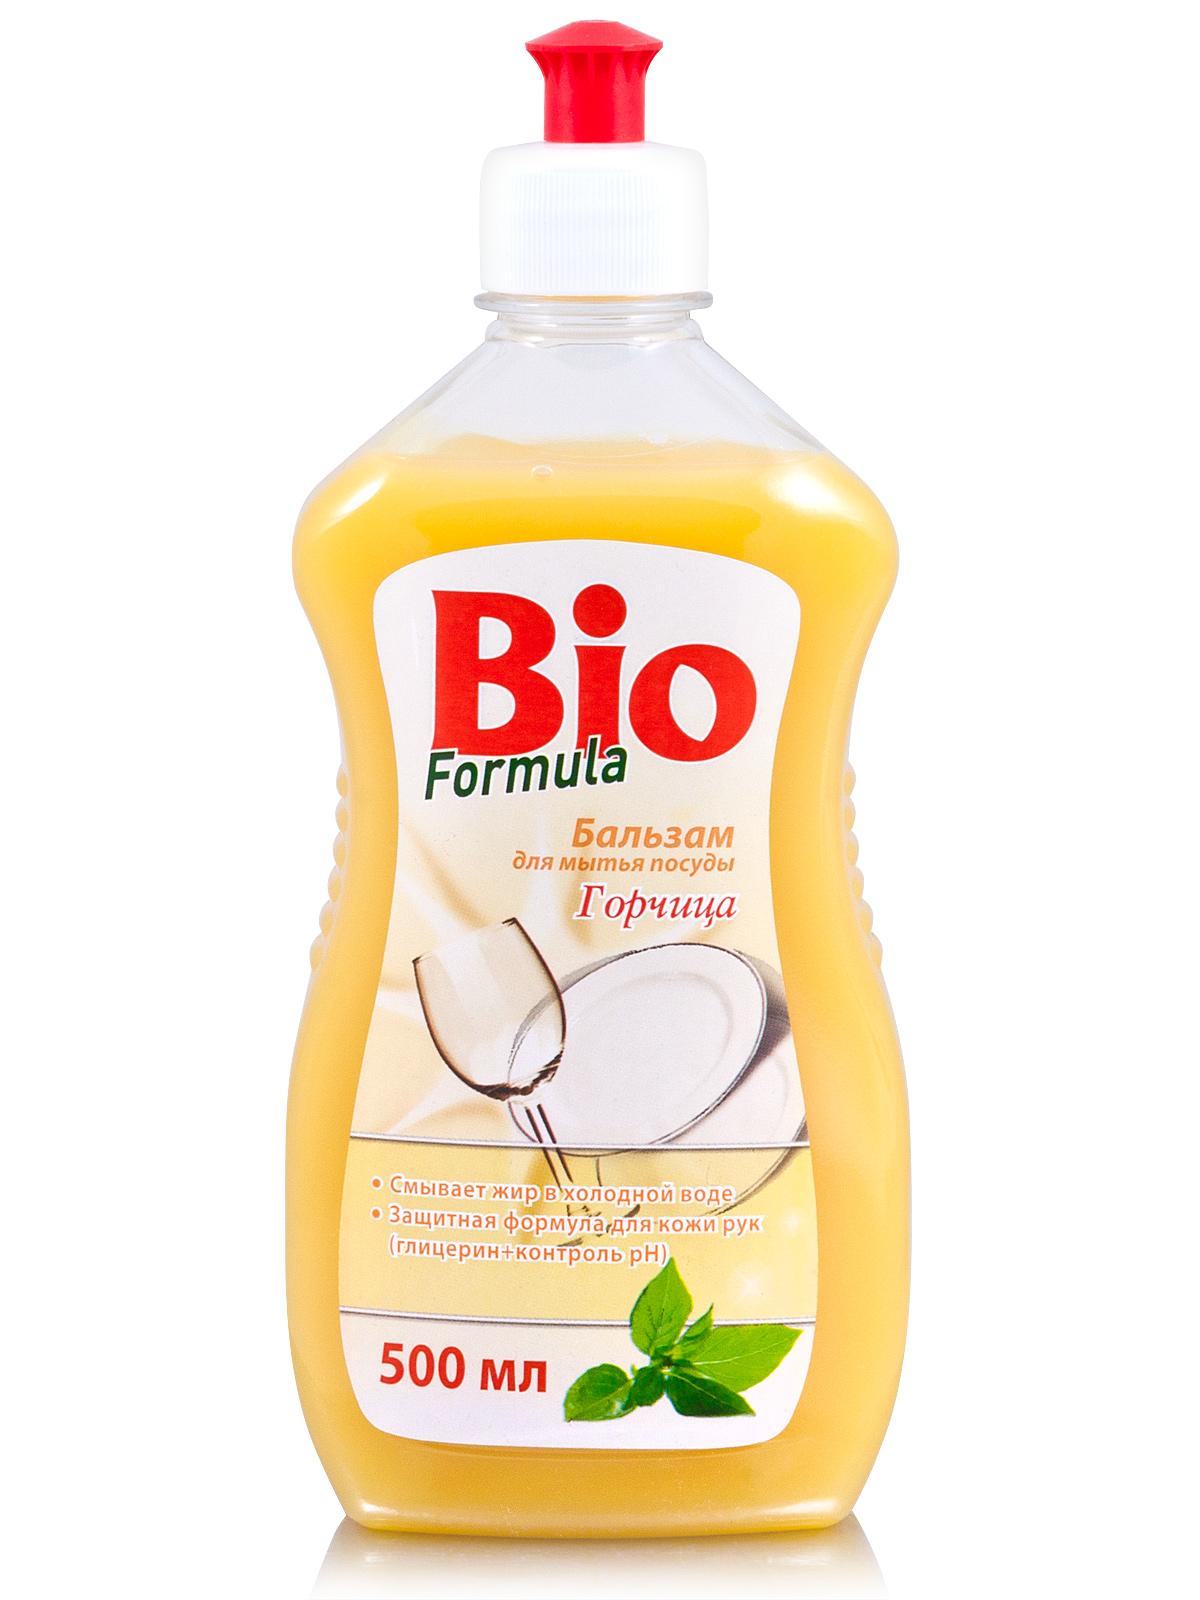 bio BIO Formula Горчица 500мл (4823015922749)